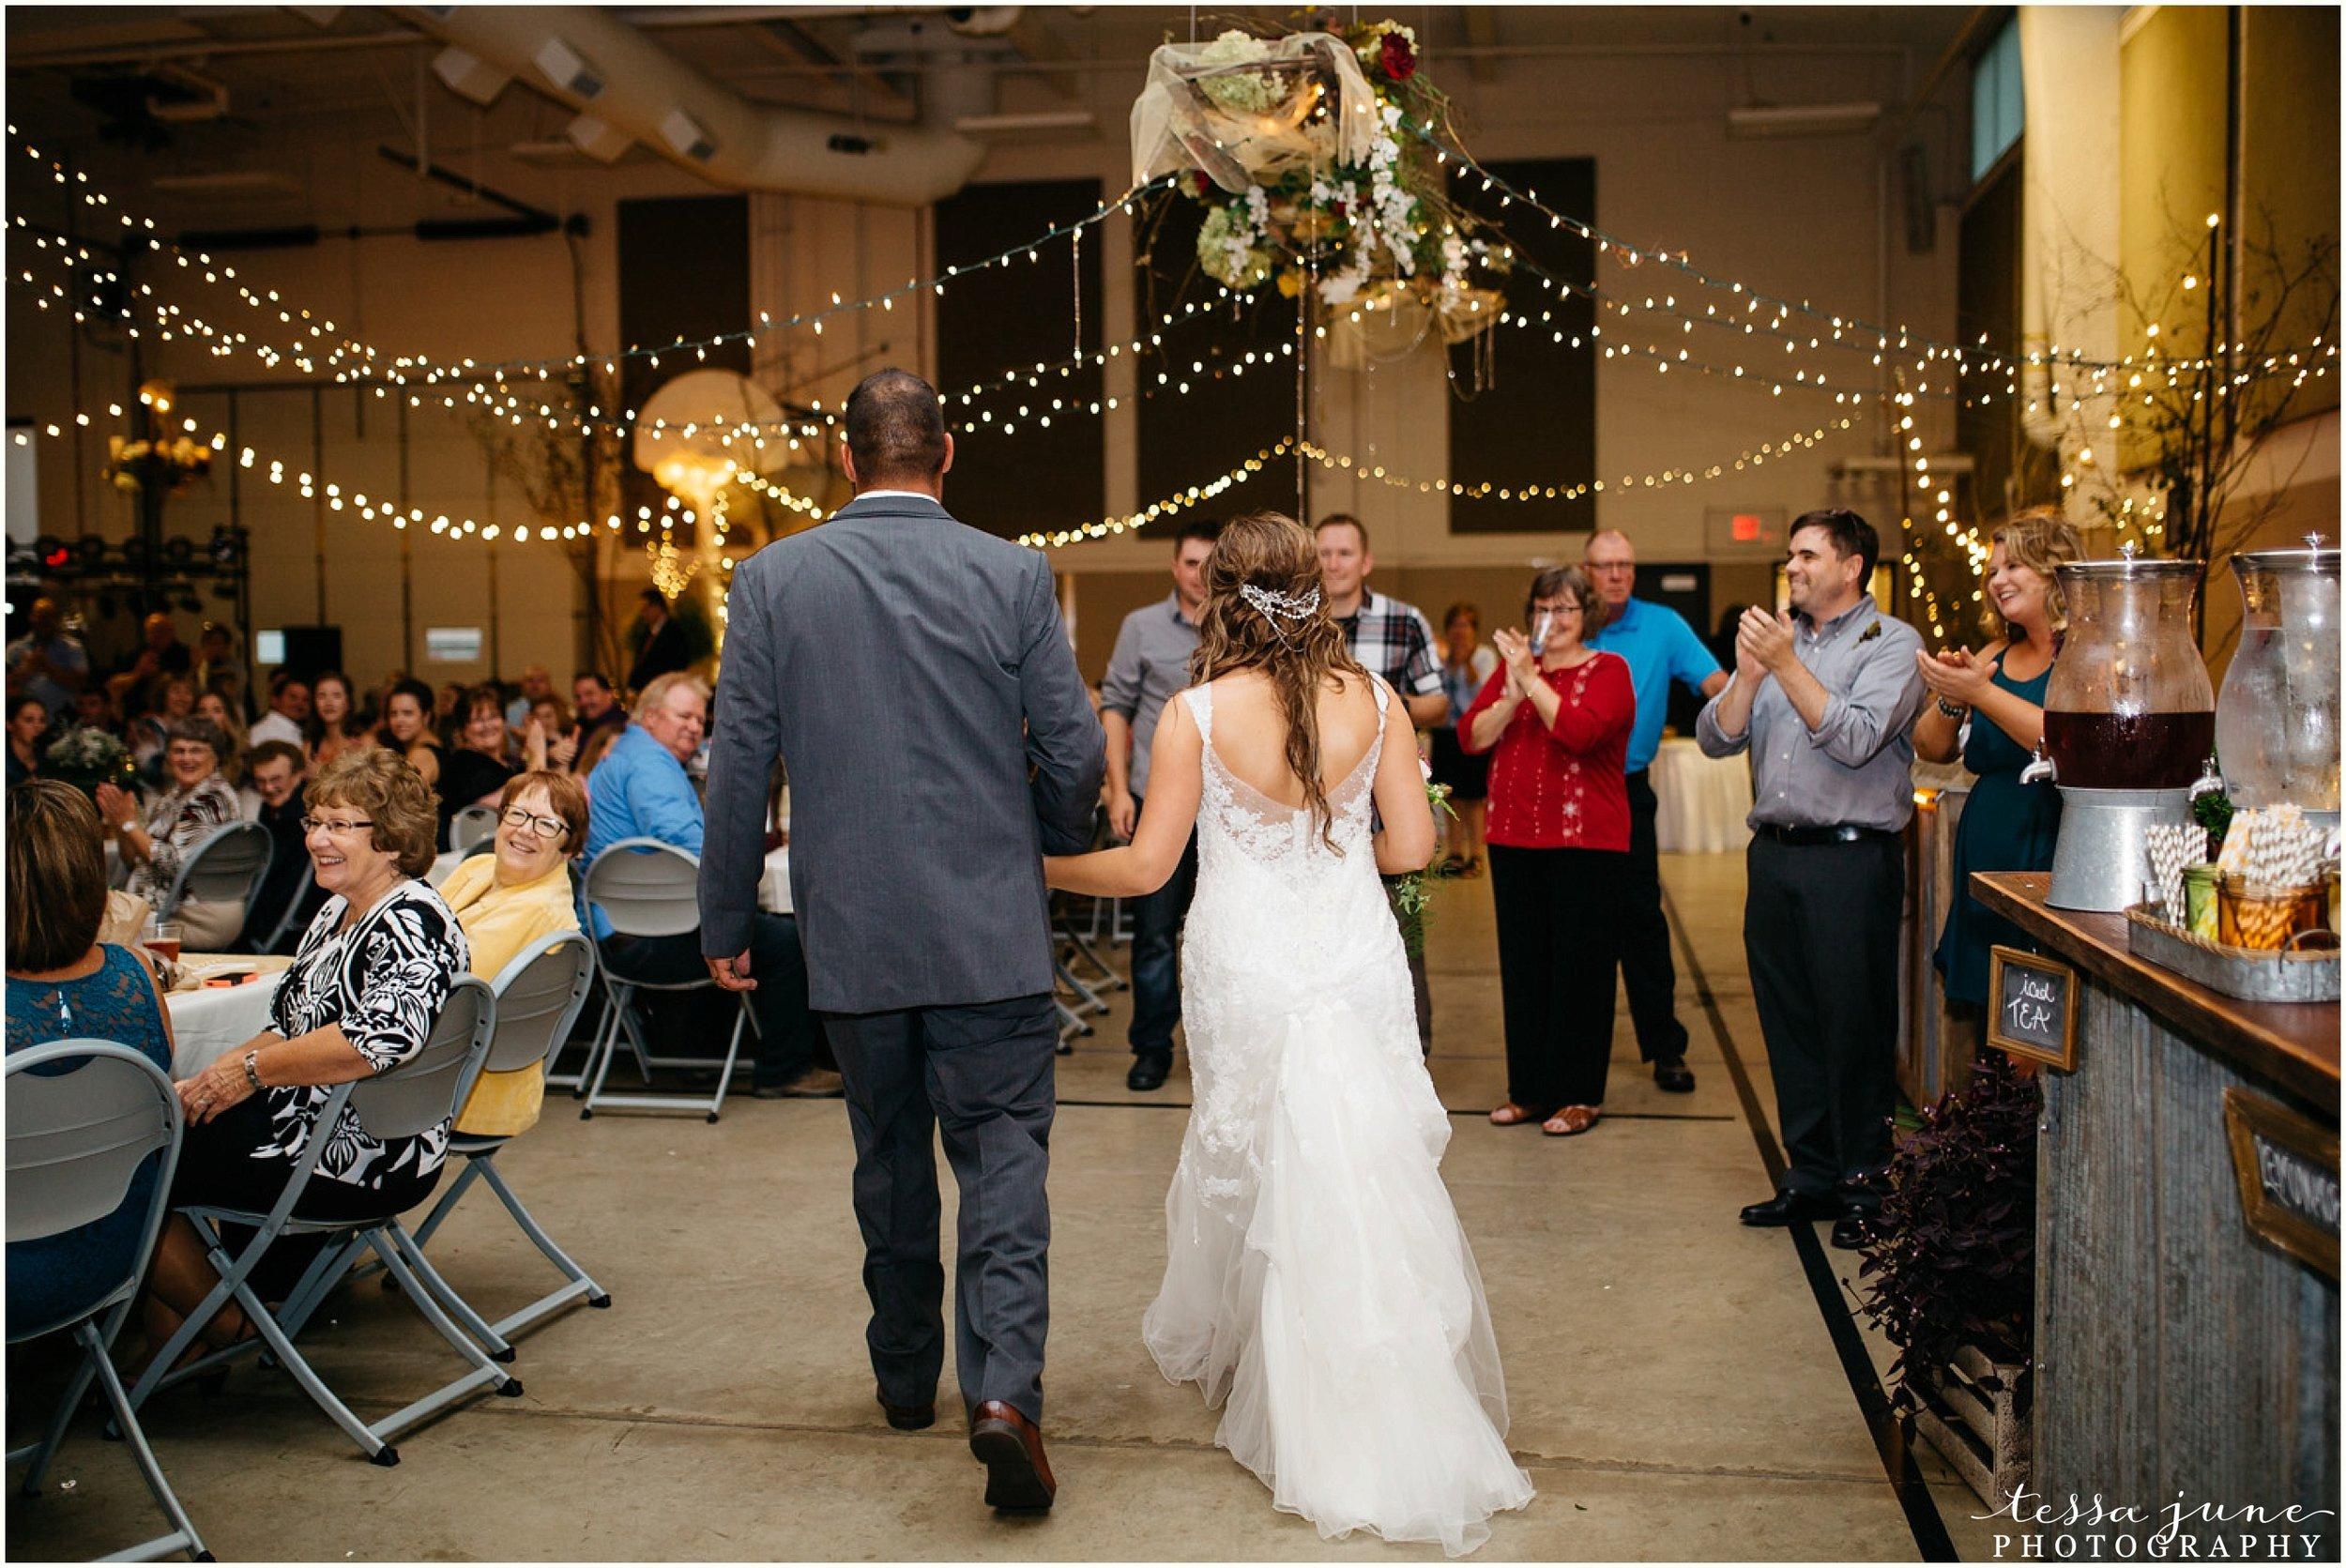 bohemian-minnesota-wedding-mismatched-bridesmaid-dresses-waterfall-st-cloud-tessa-june-photography-156.jpg